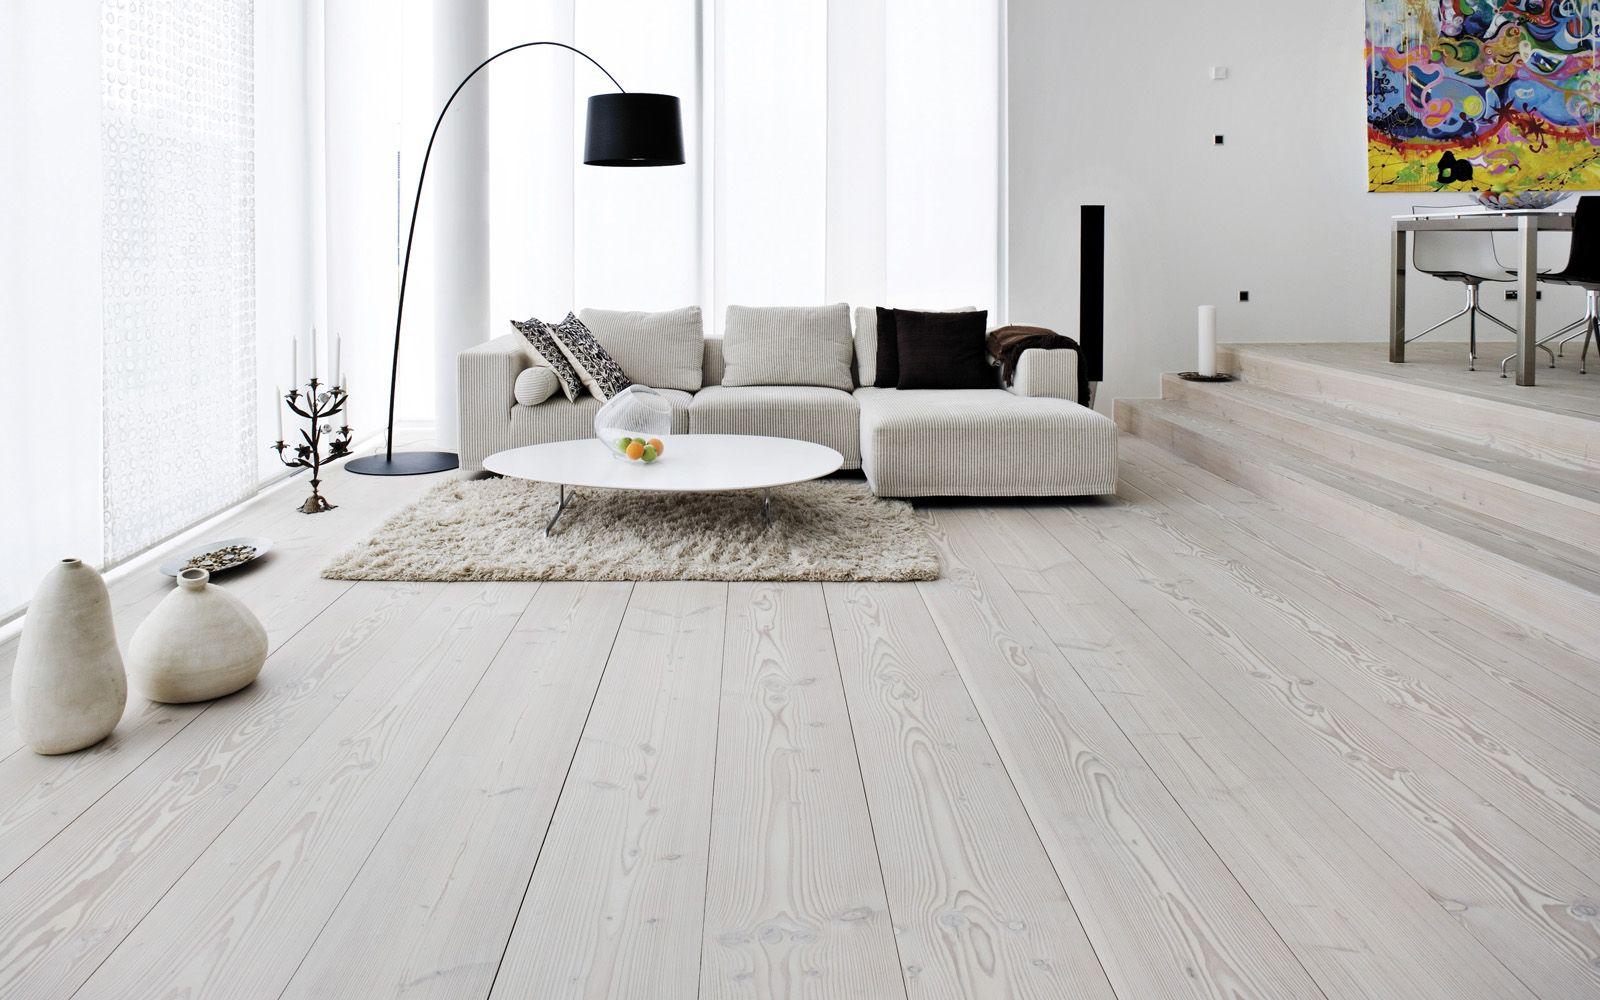 spectacular Light Wood Floors Interior moesihomes